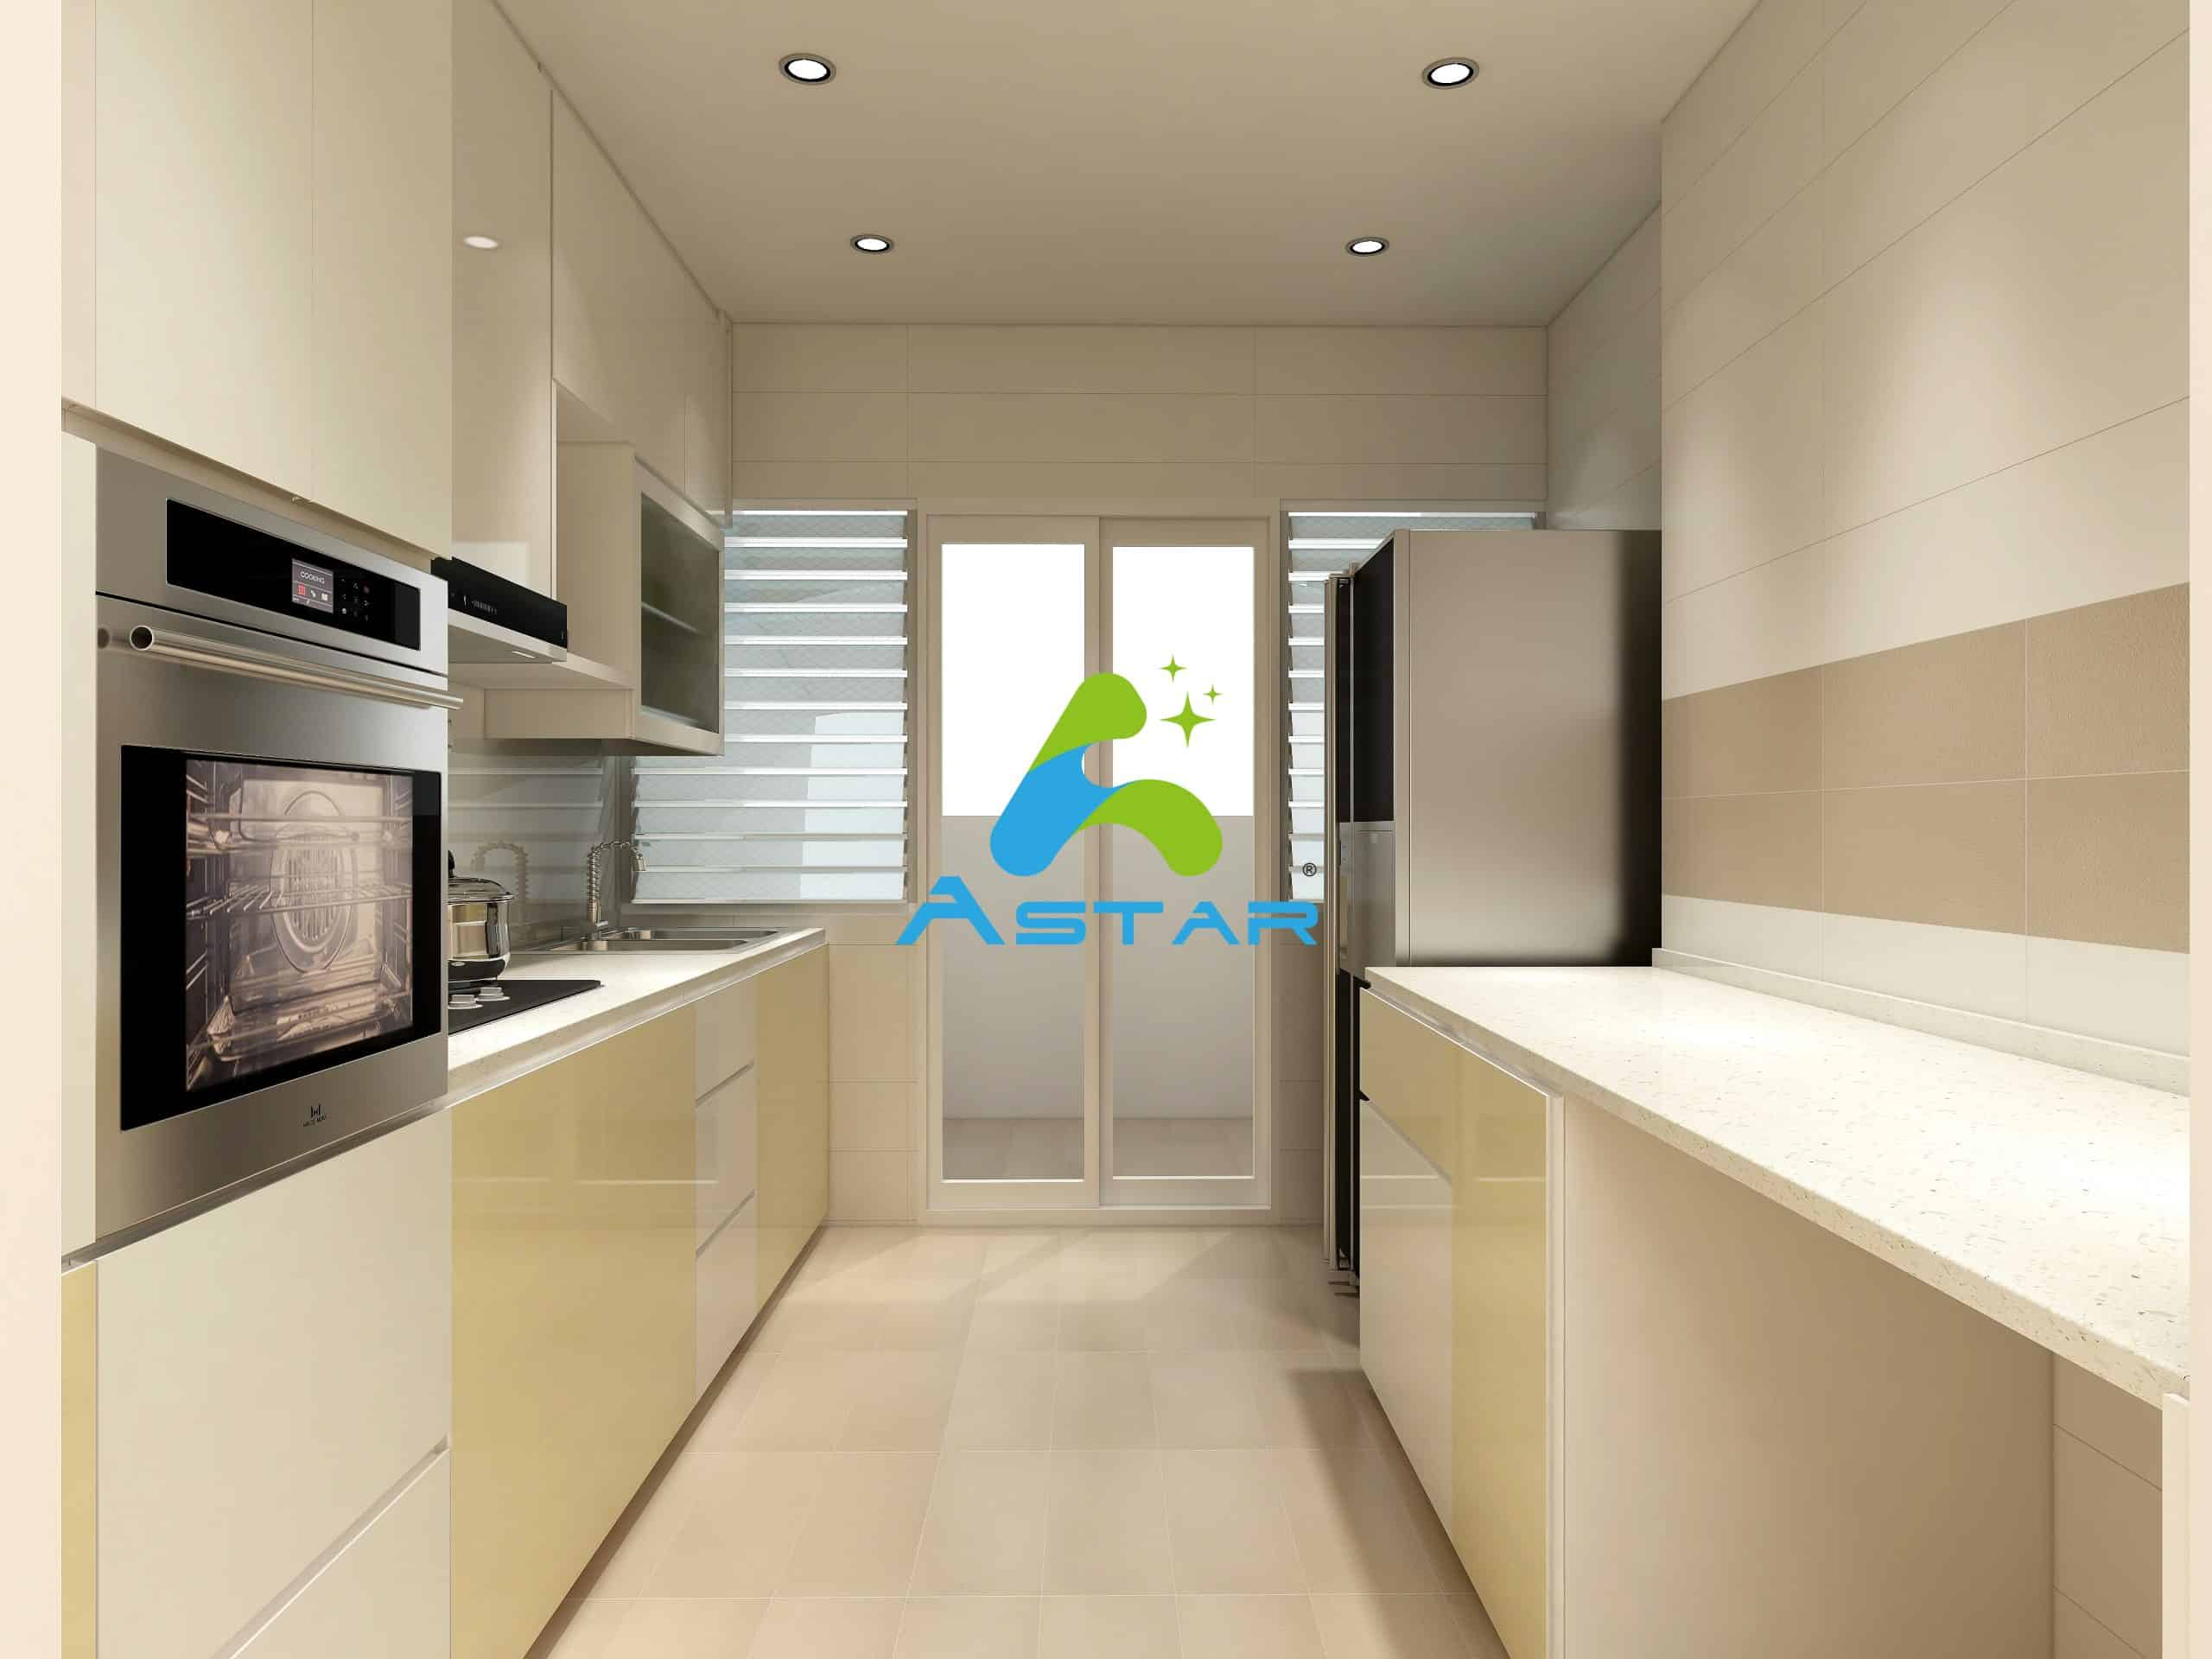 a star furnishing aluminium projects 14. Blk 453B Bukit Batok 046 scaled